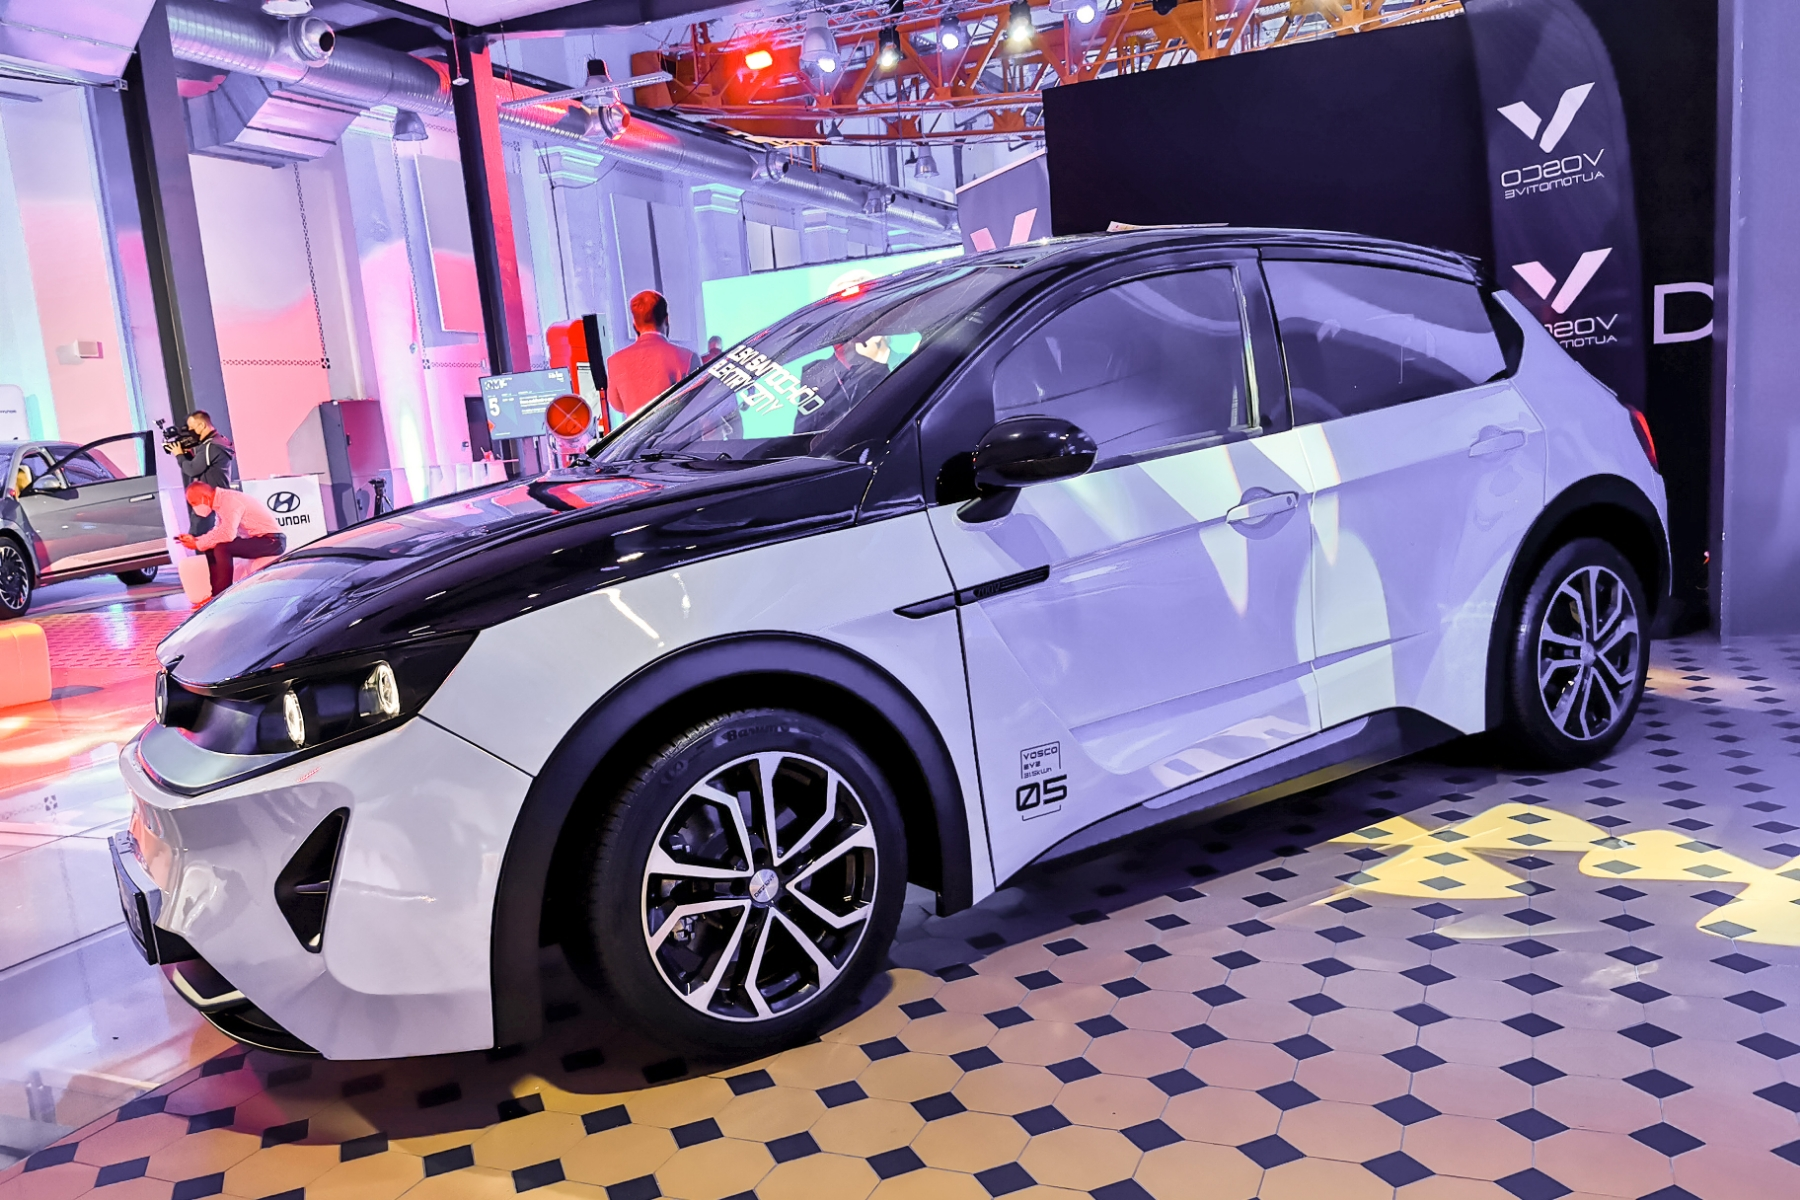 polski samochód elektryczny Vosco EV2